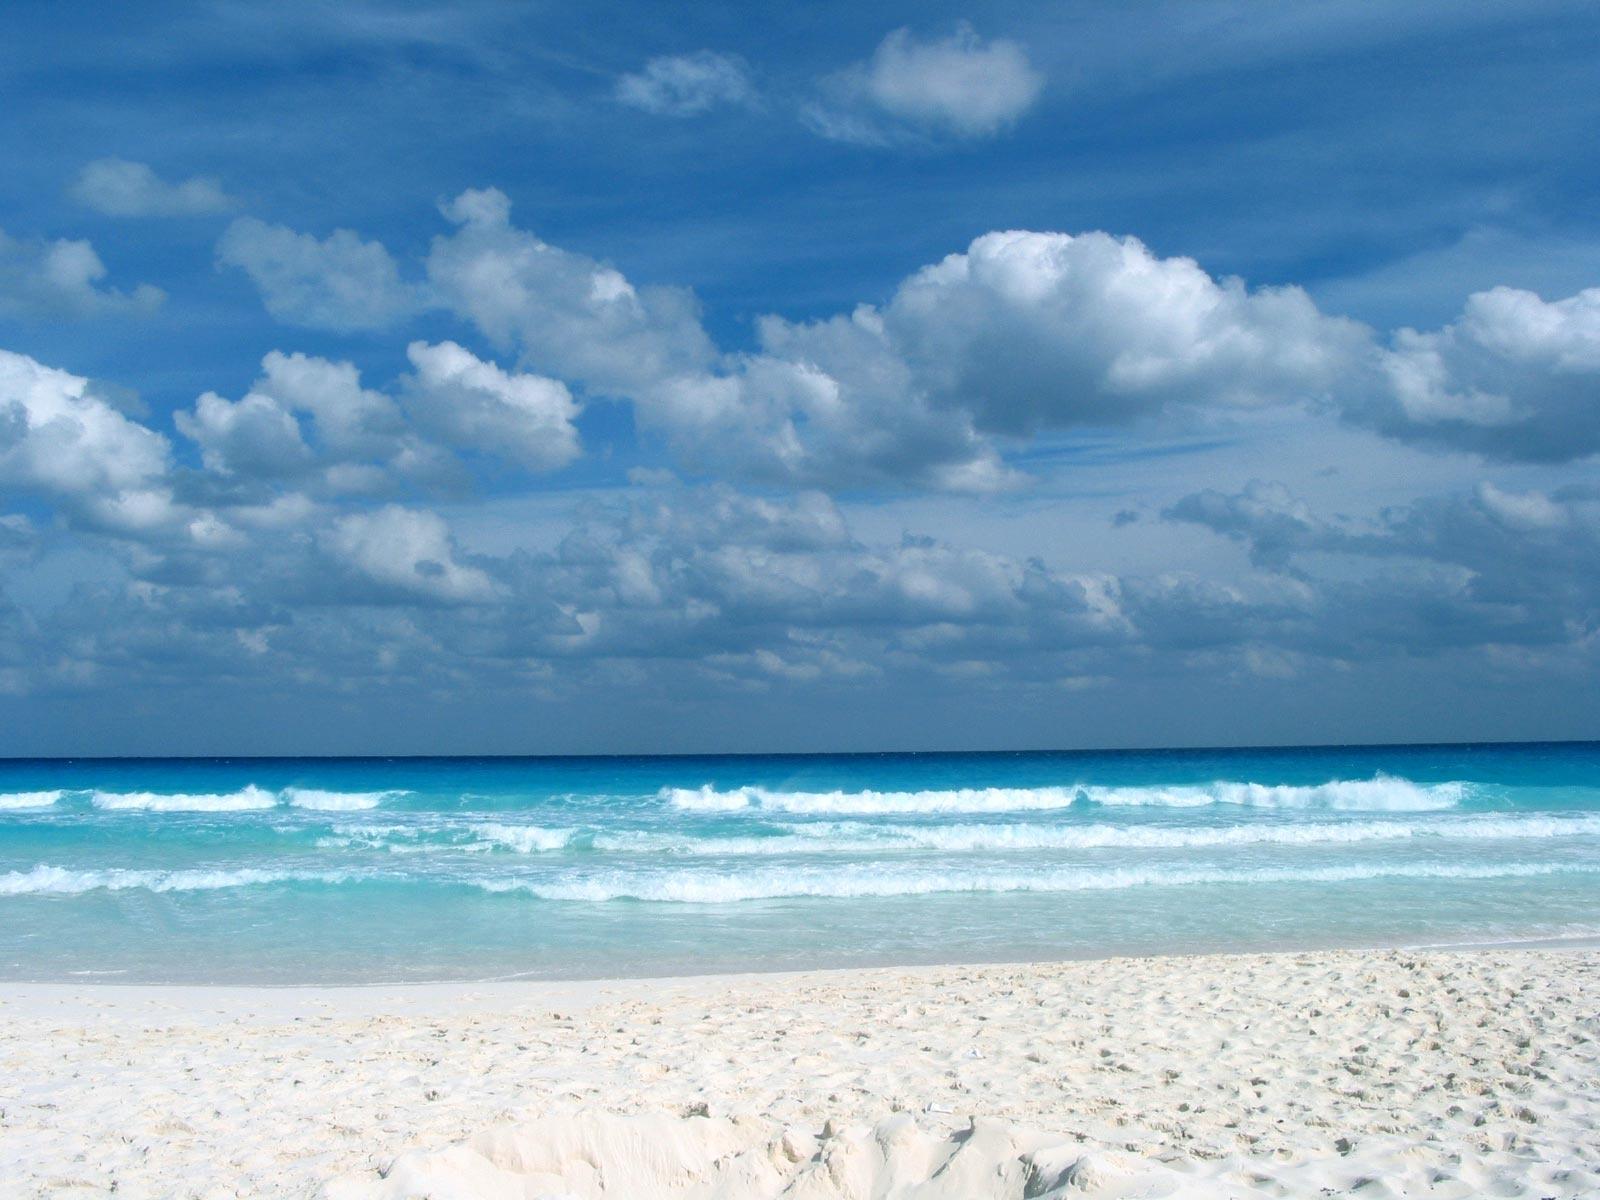 http://4.bp.blogspot.com/-dnfrpFzWRdg/UJtaOEJtDiI/AAAAAAAABn4/CYynLwf0wAA/s1600/beach%2Bpictures%2B6.jpg